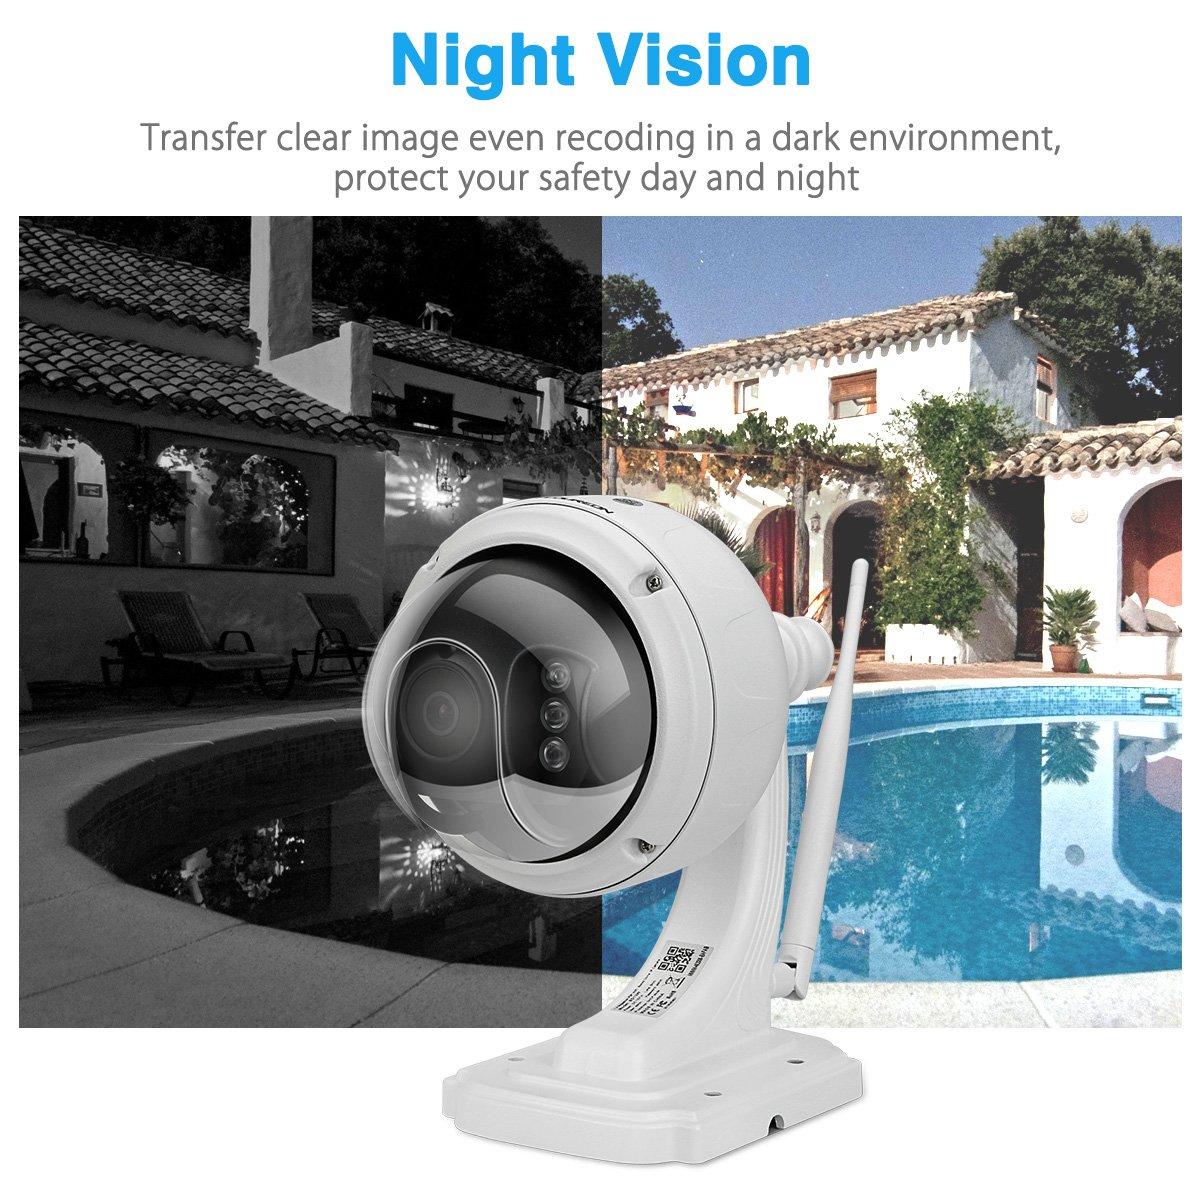 FLOUREON WIFI IP Camera 960P Wireless HD H.264 Waterproof CCTV Security PT Camera with Built-in Mic 355°Pan/ 90°Tilt, Alarm Recording, Night Vision, Micro SD Card Slot